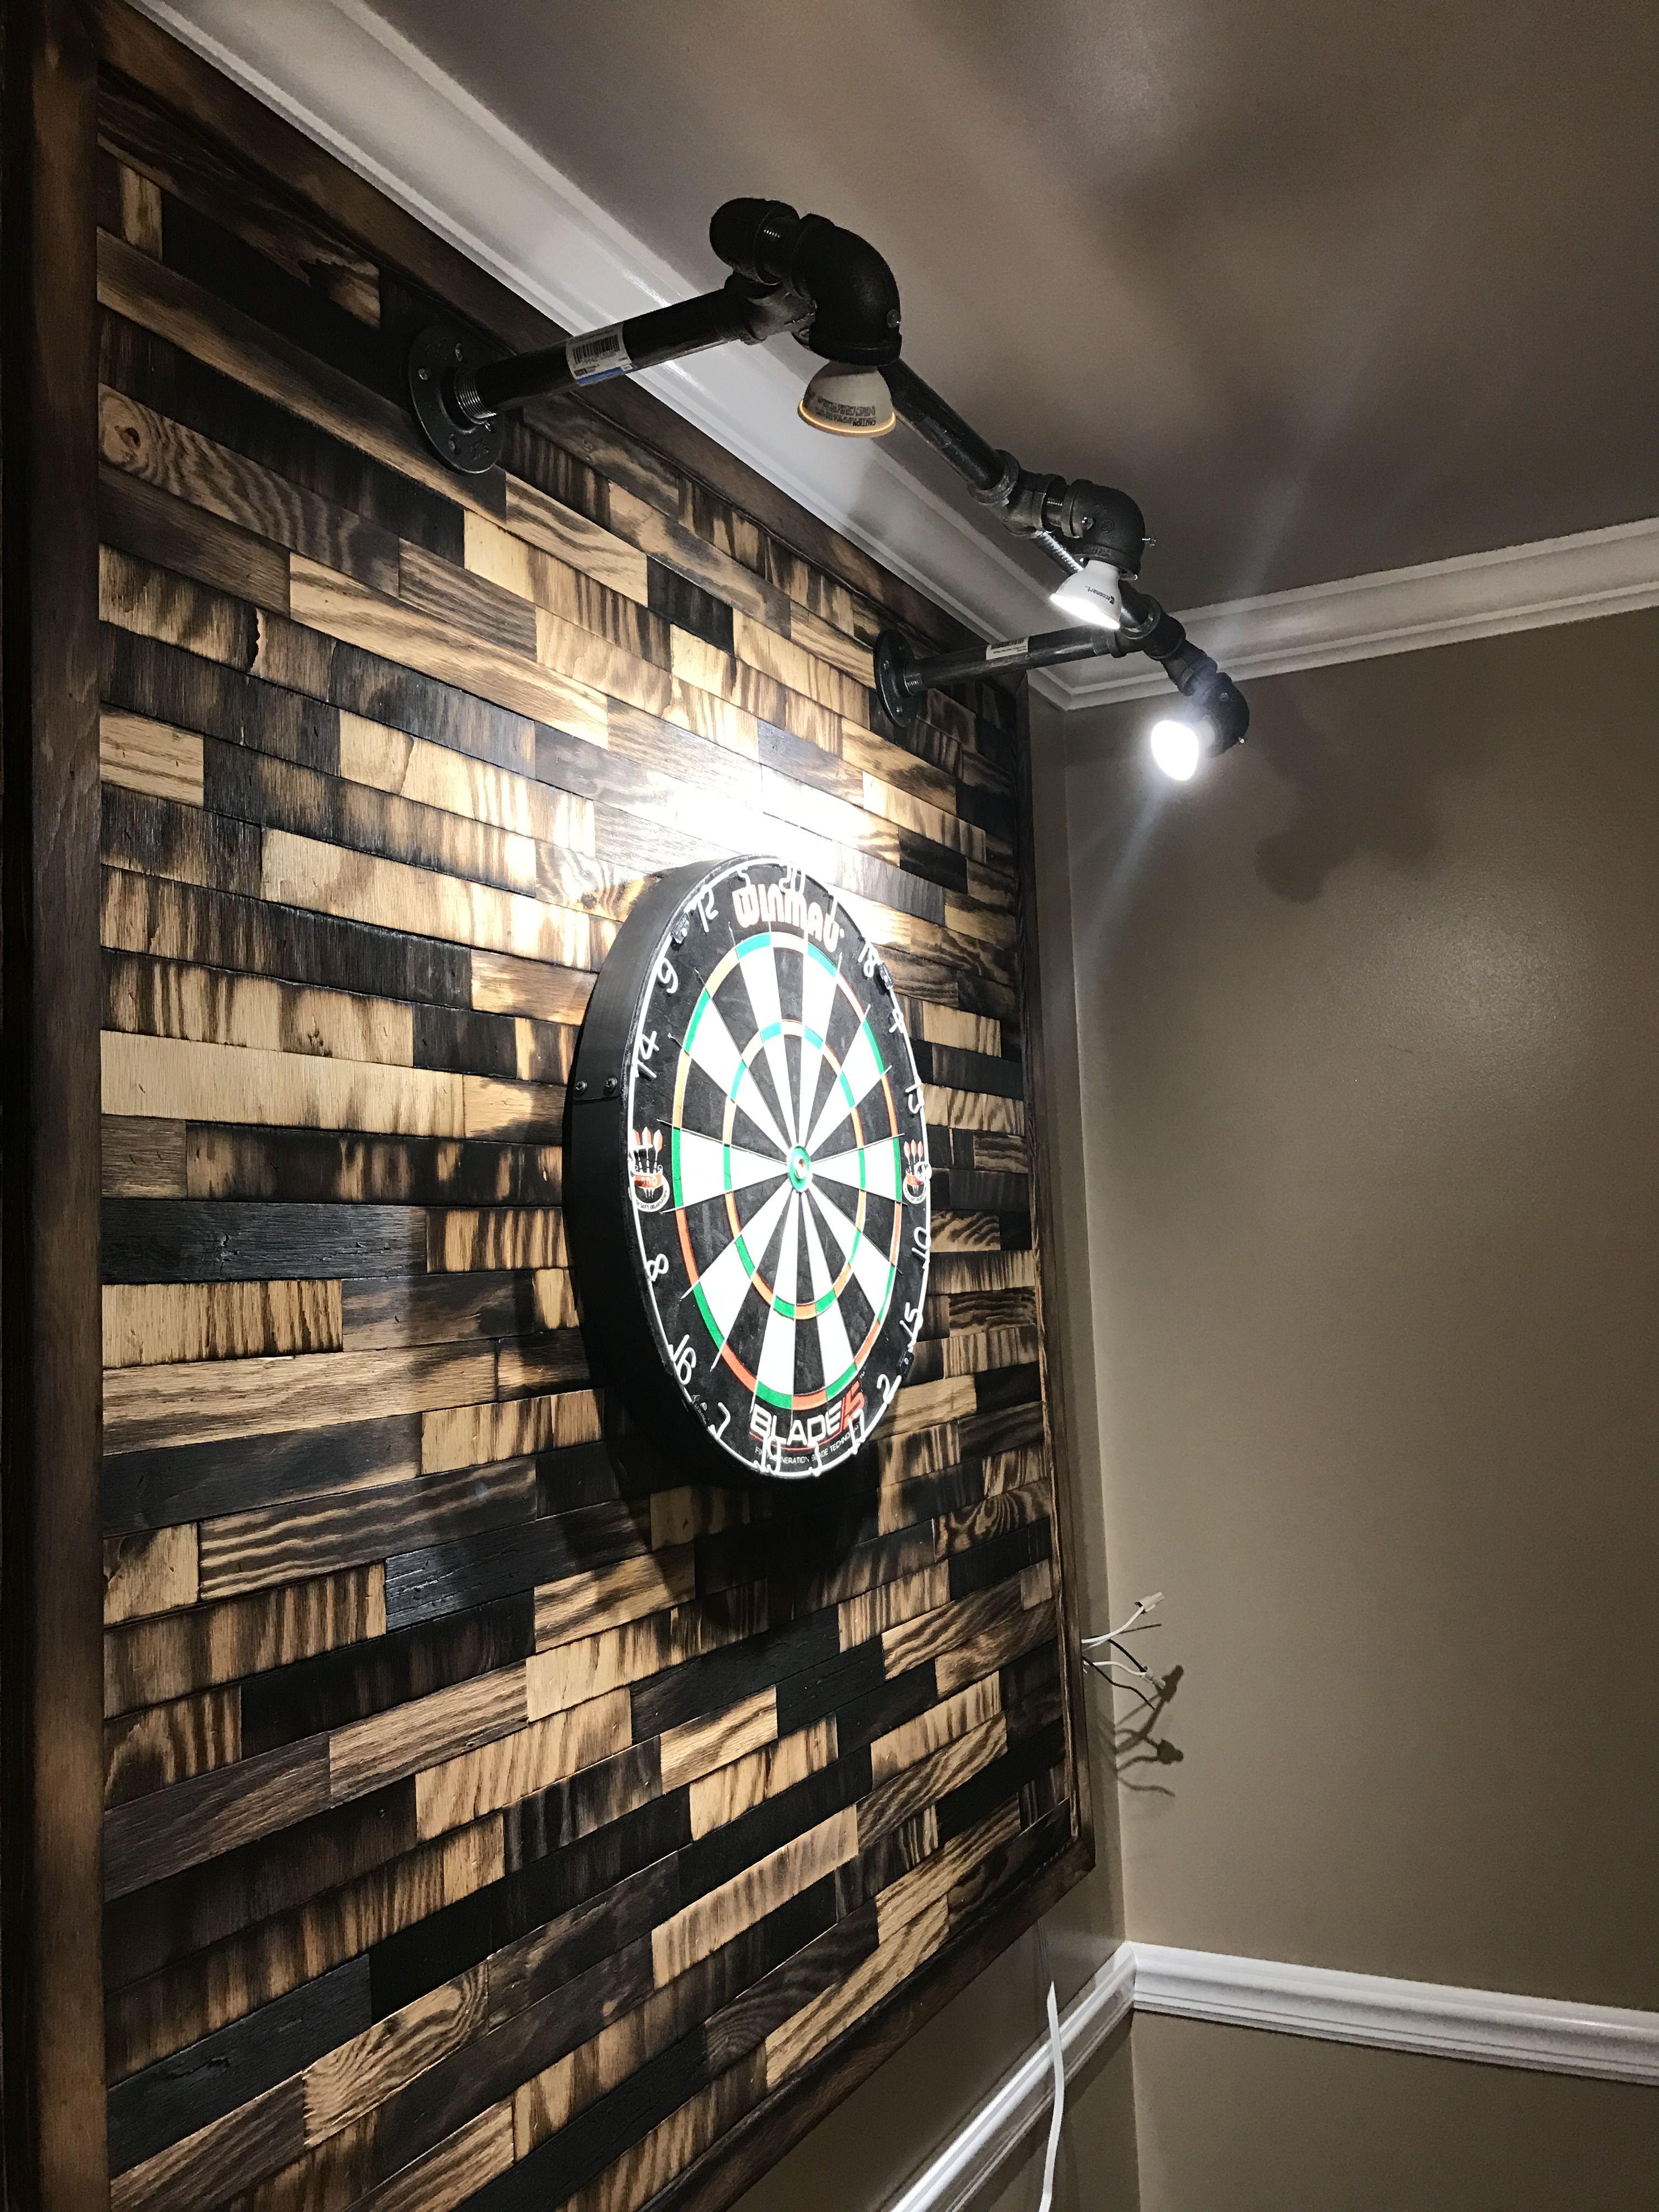 built a backer for my dart board using shou sugi ban a technique